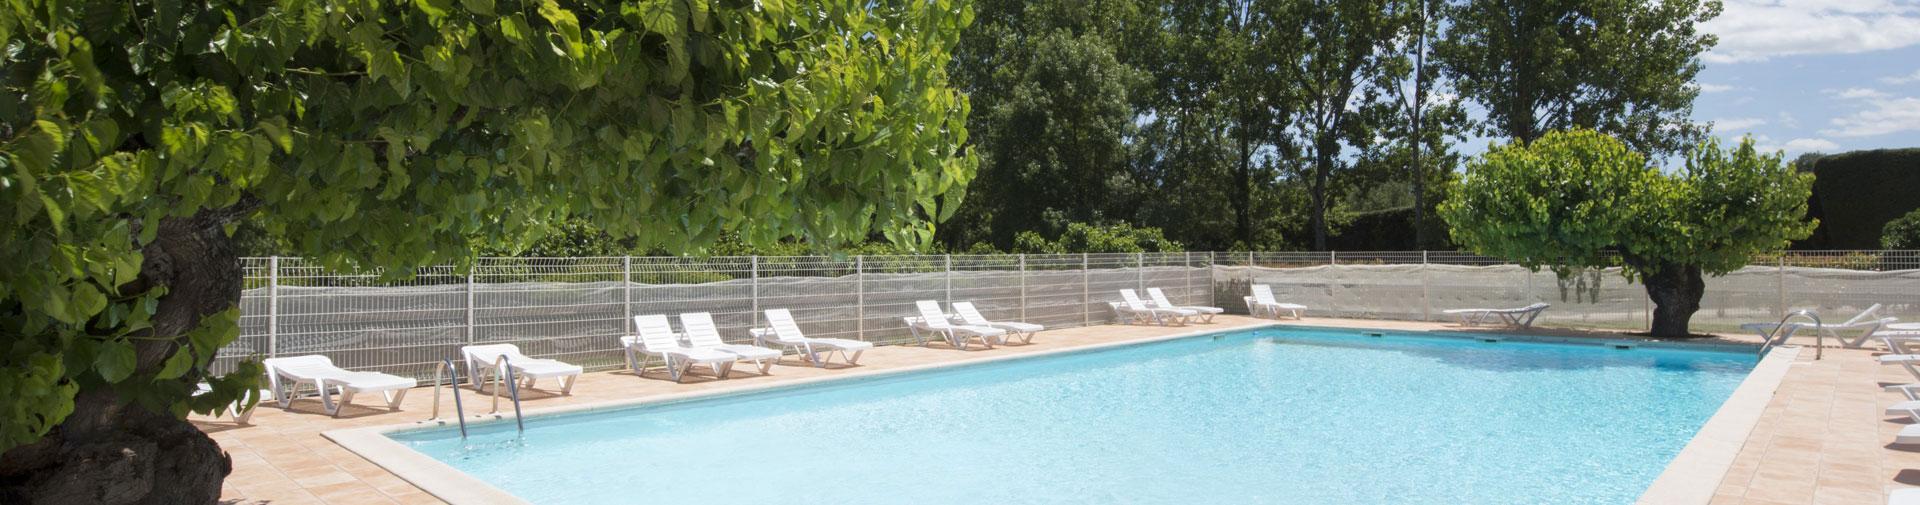 camping-gard-piscine-plein-air